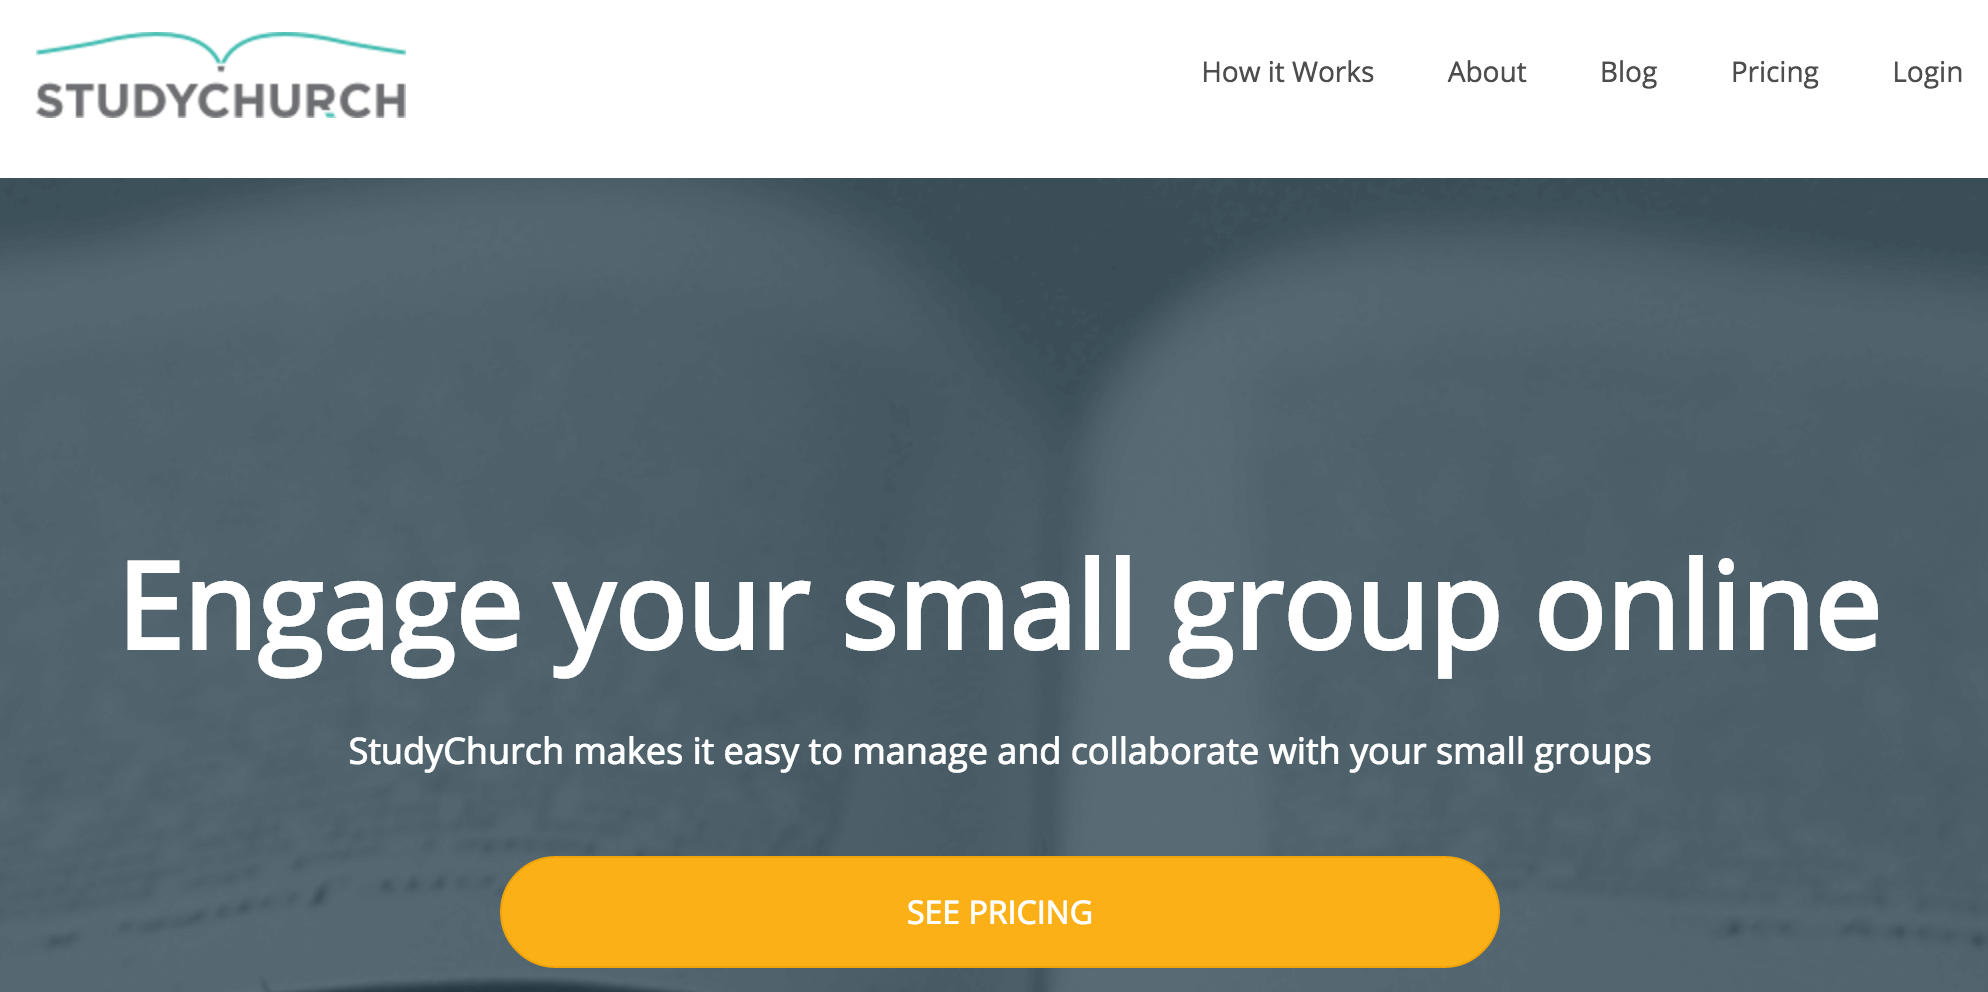 The StudyChurch homepage.